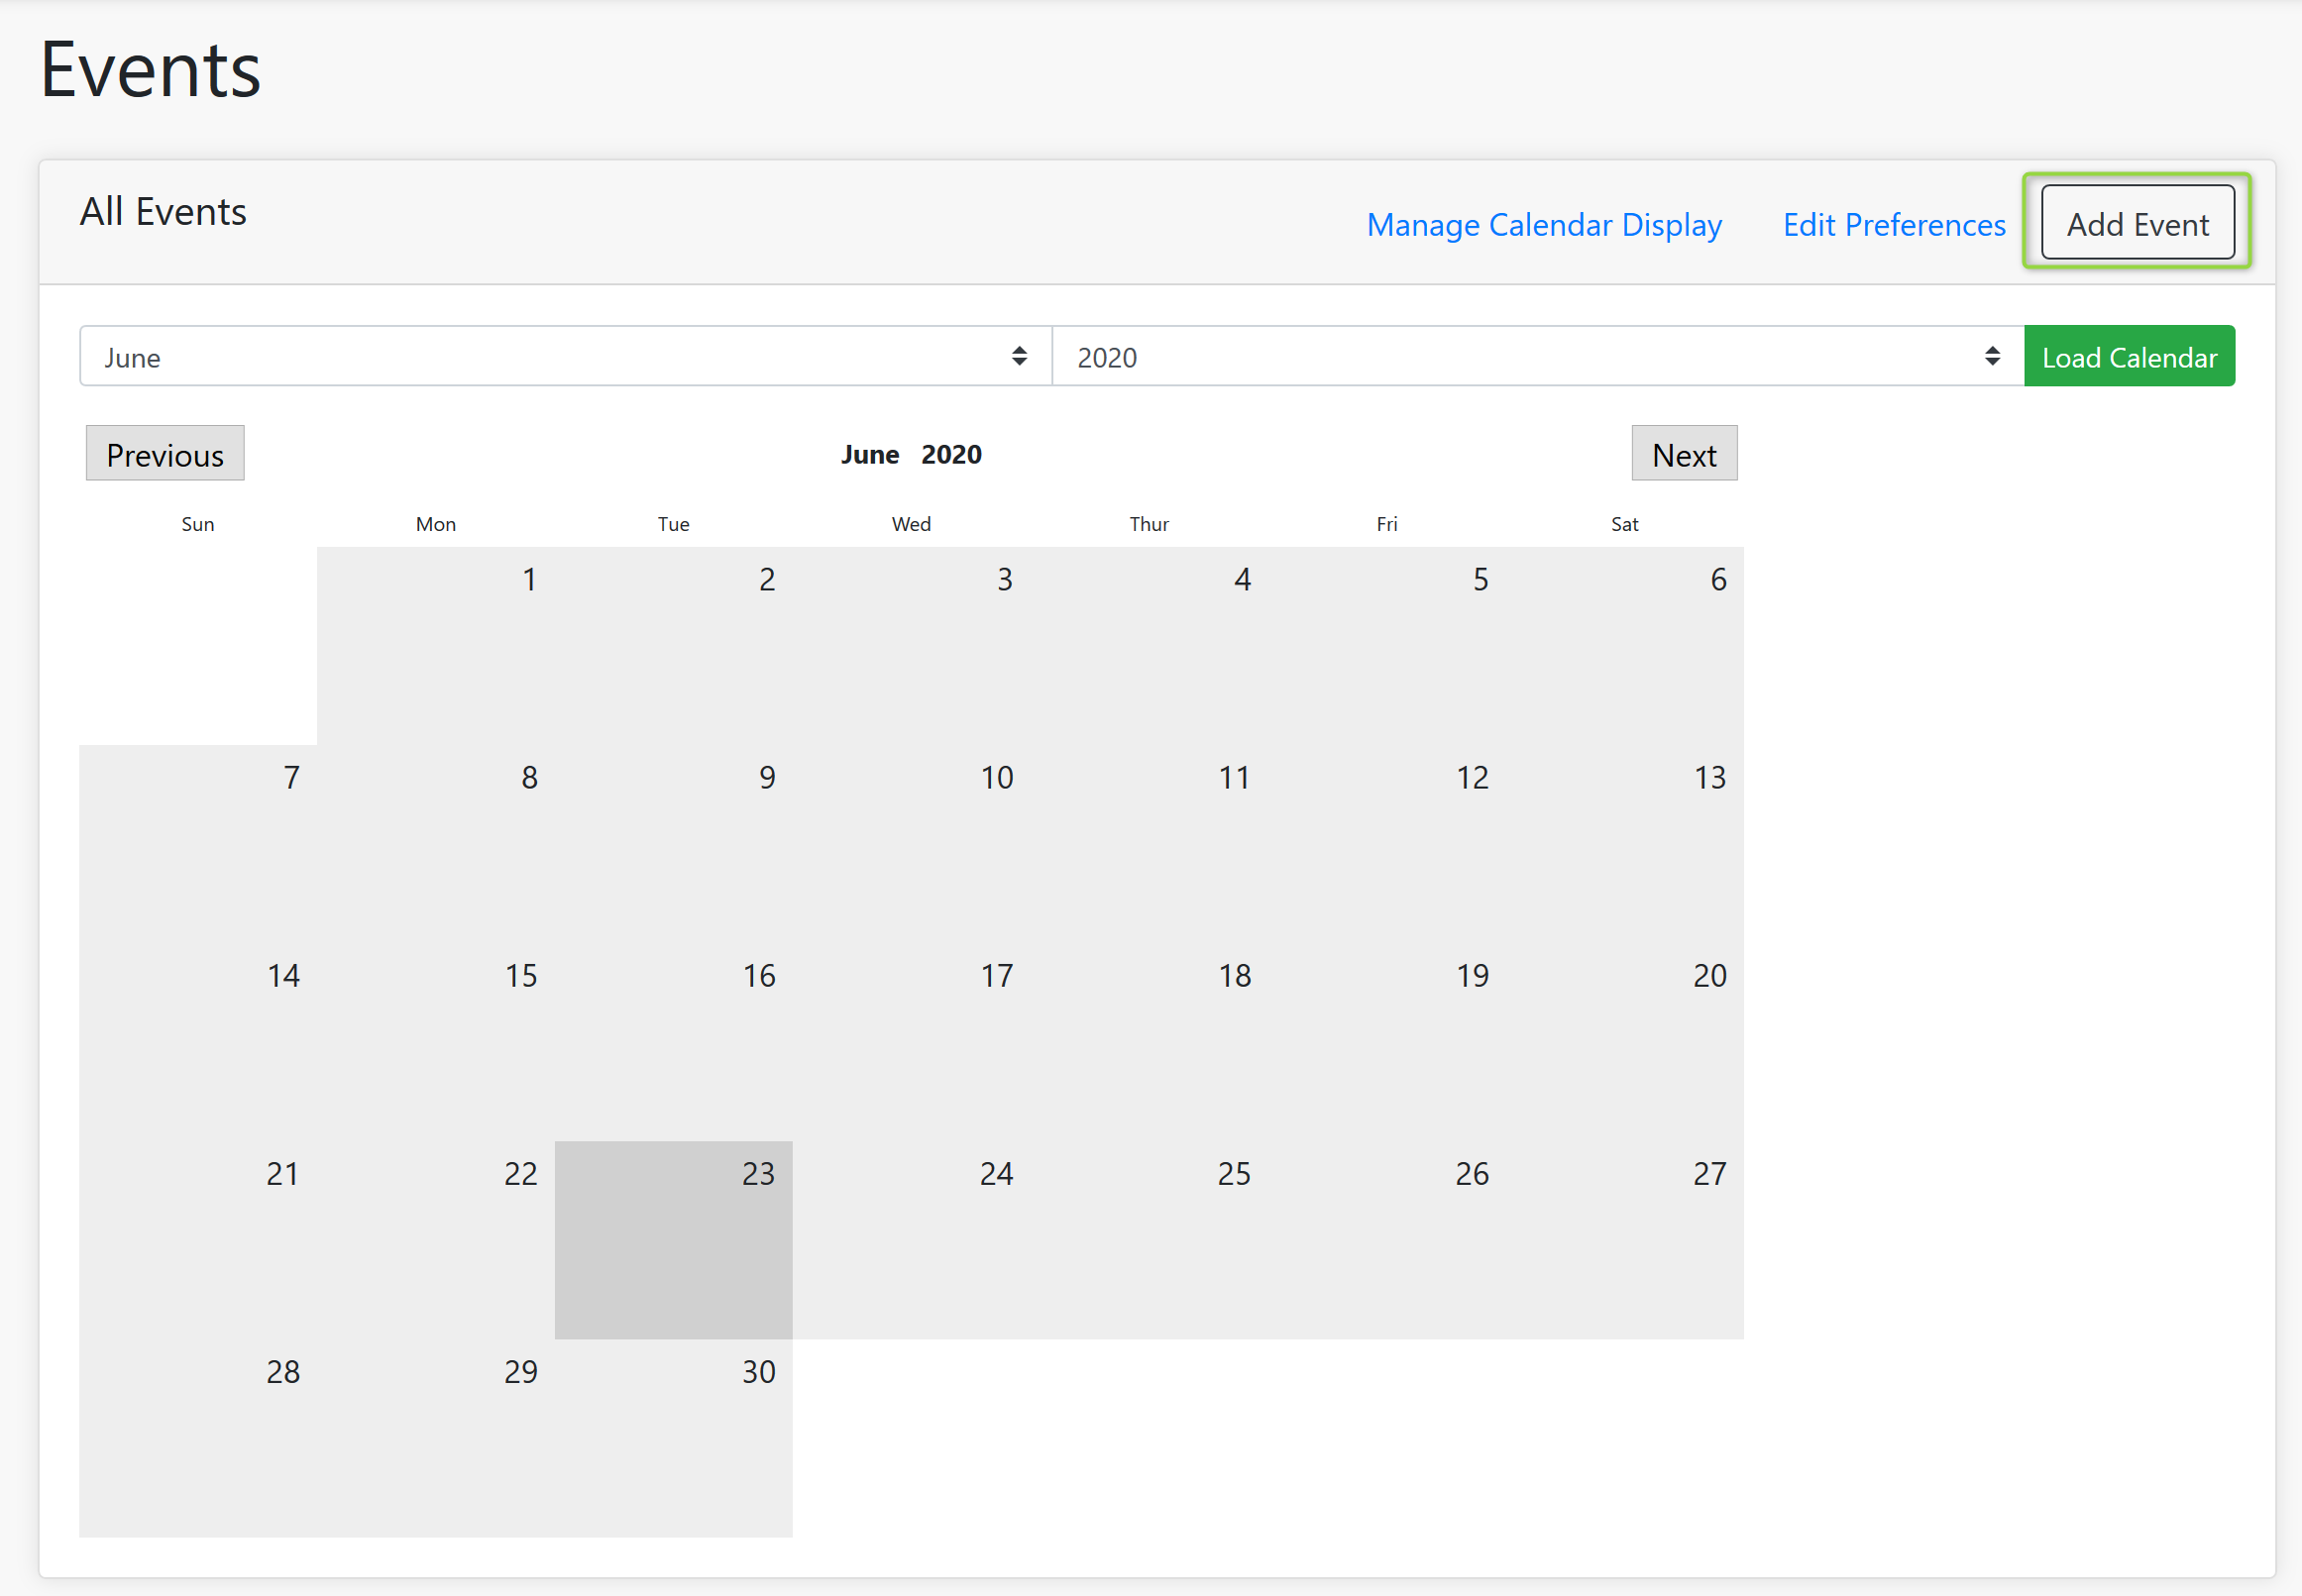 Events Screenshot